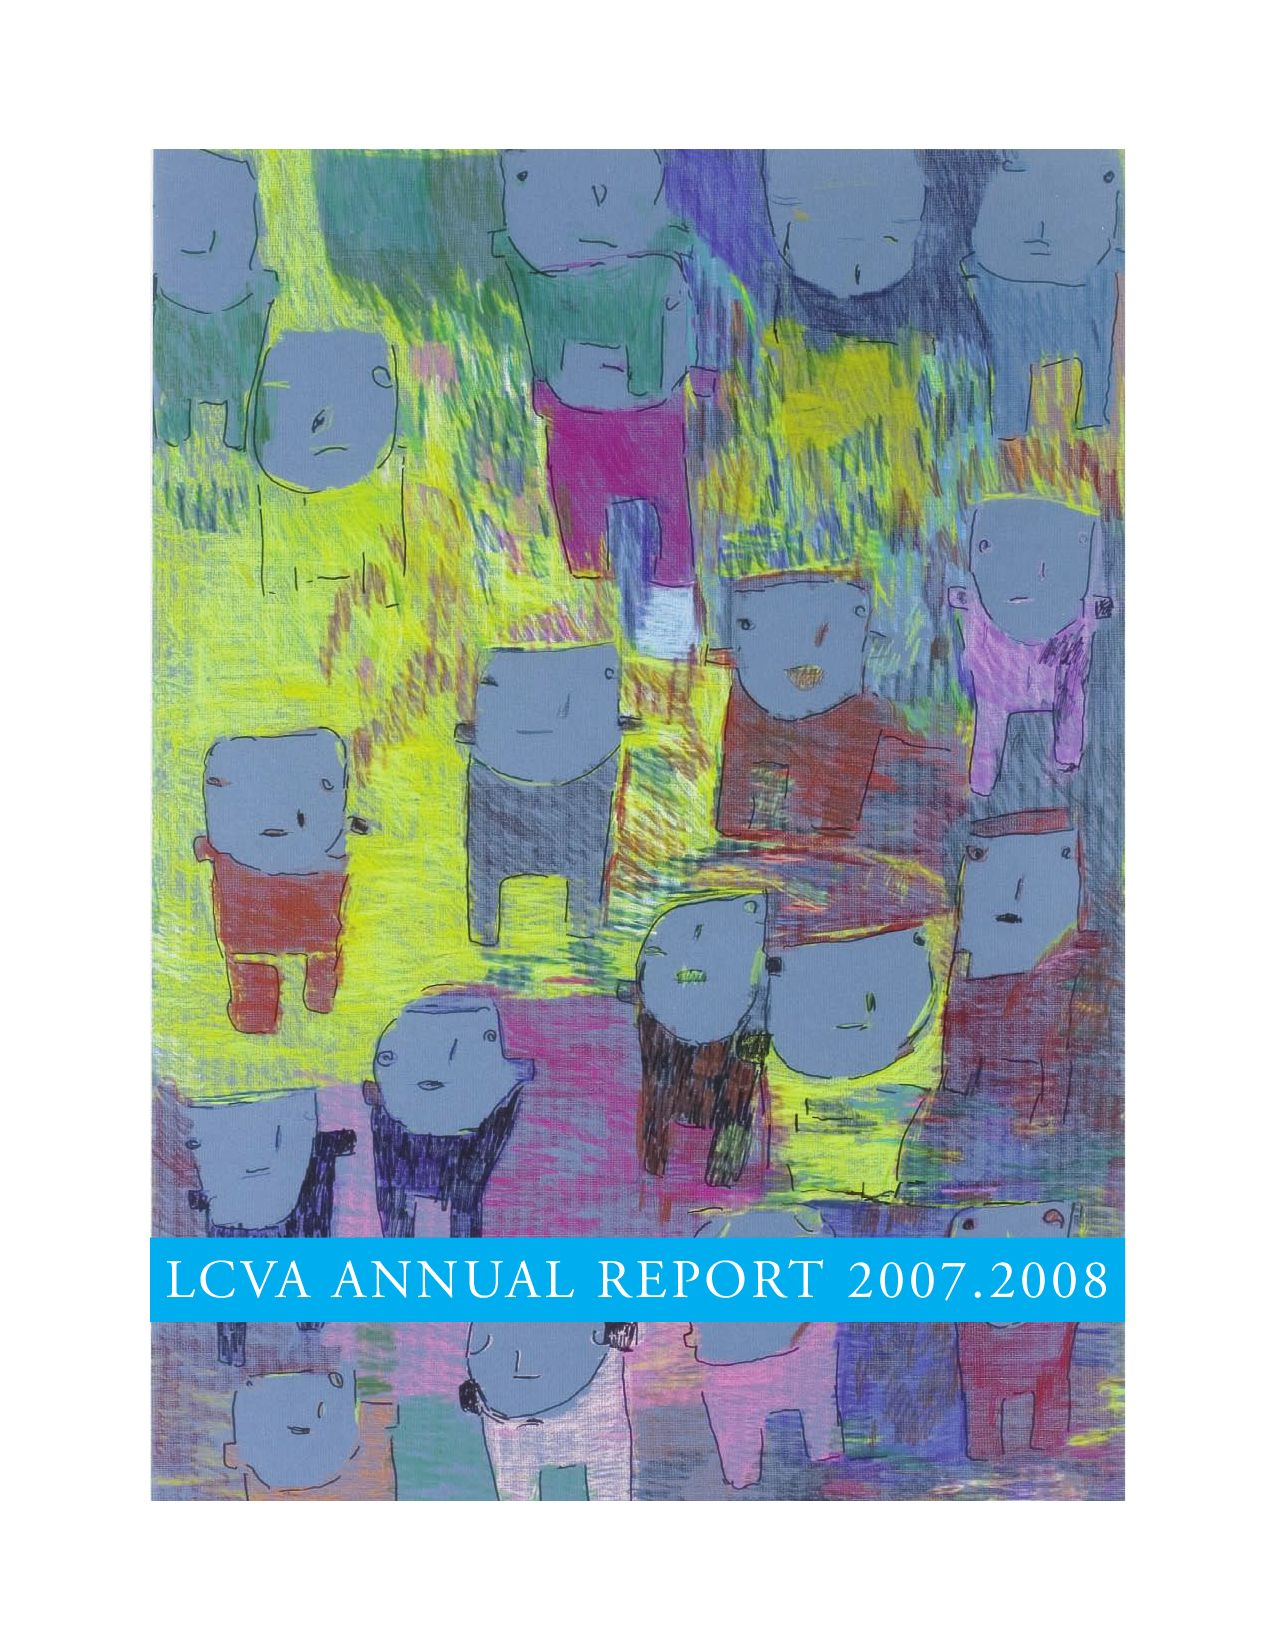 lcva annual report 2007-2008 by longwood university